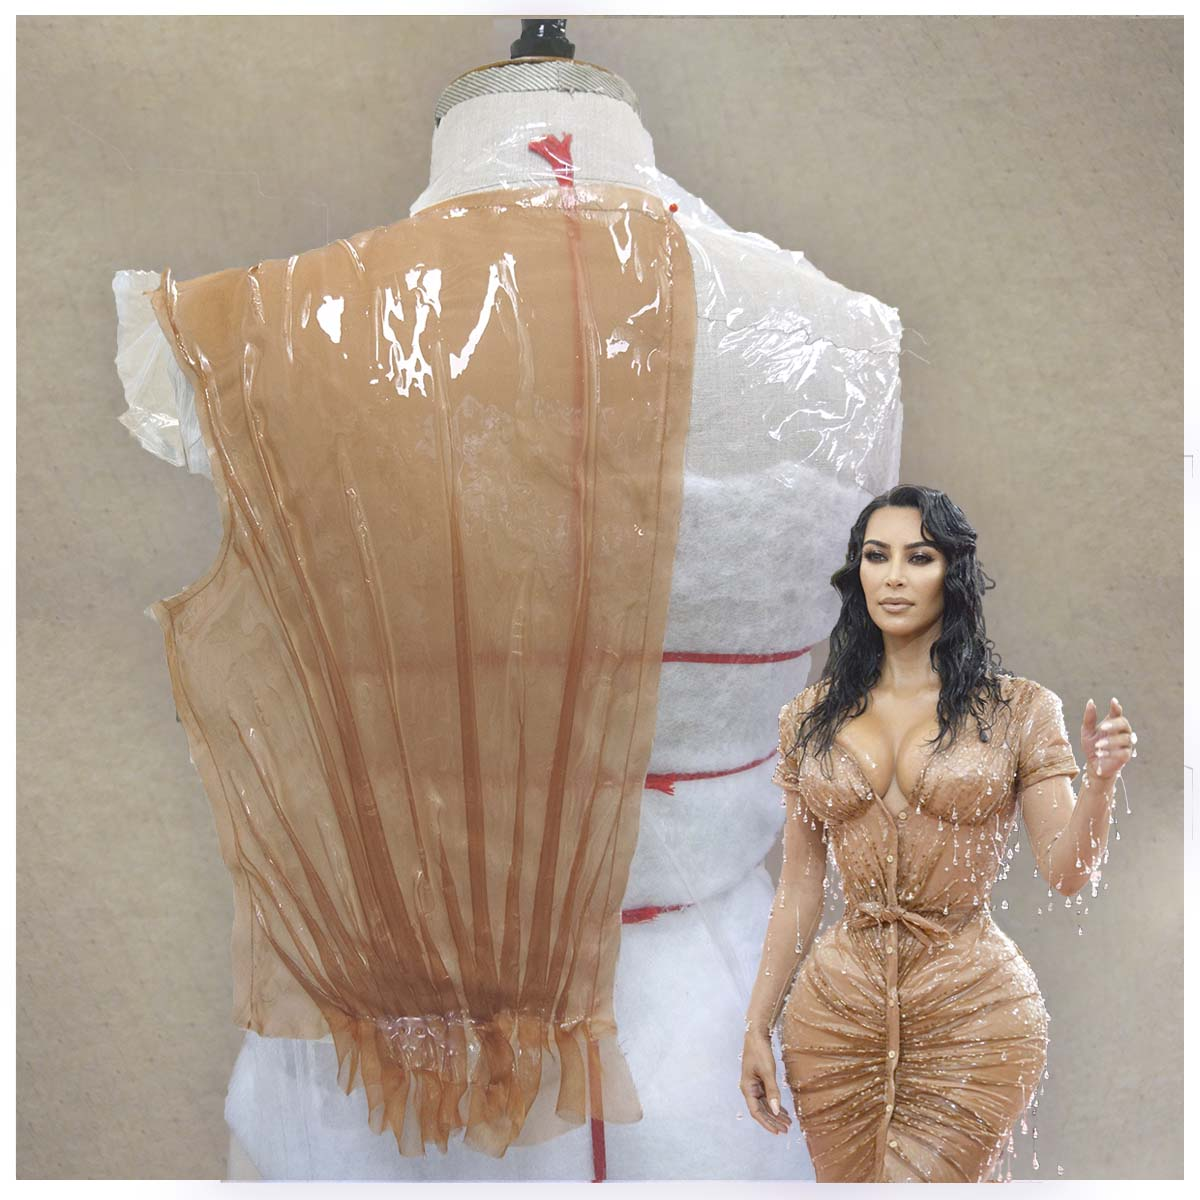 Thierry Mugler pour Kim KardashianMet Gala 2019Collaboration avec Studio FBG ParisSilicone et aérographe sur tissu